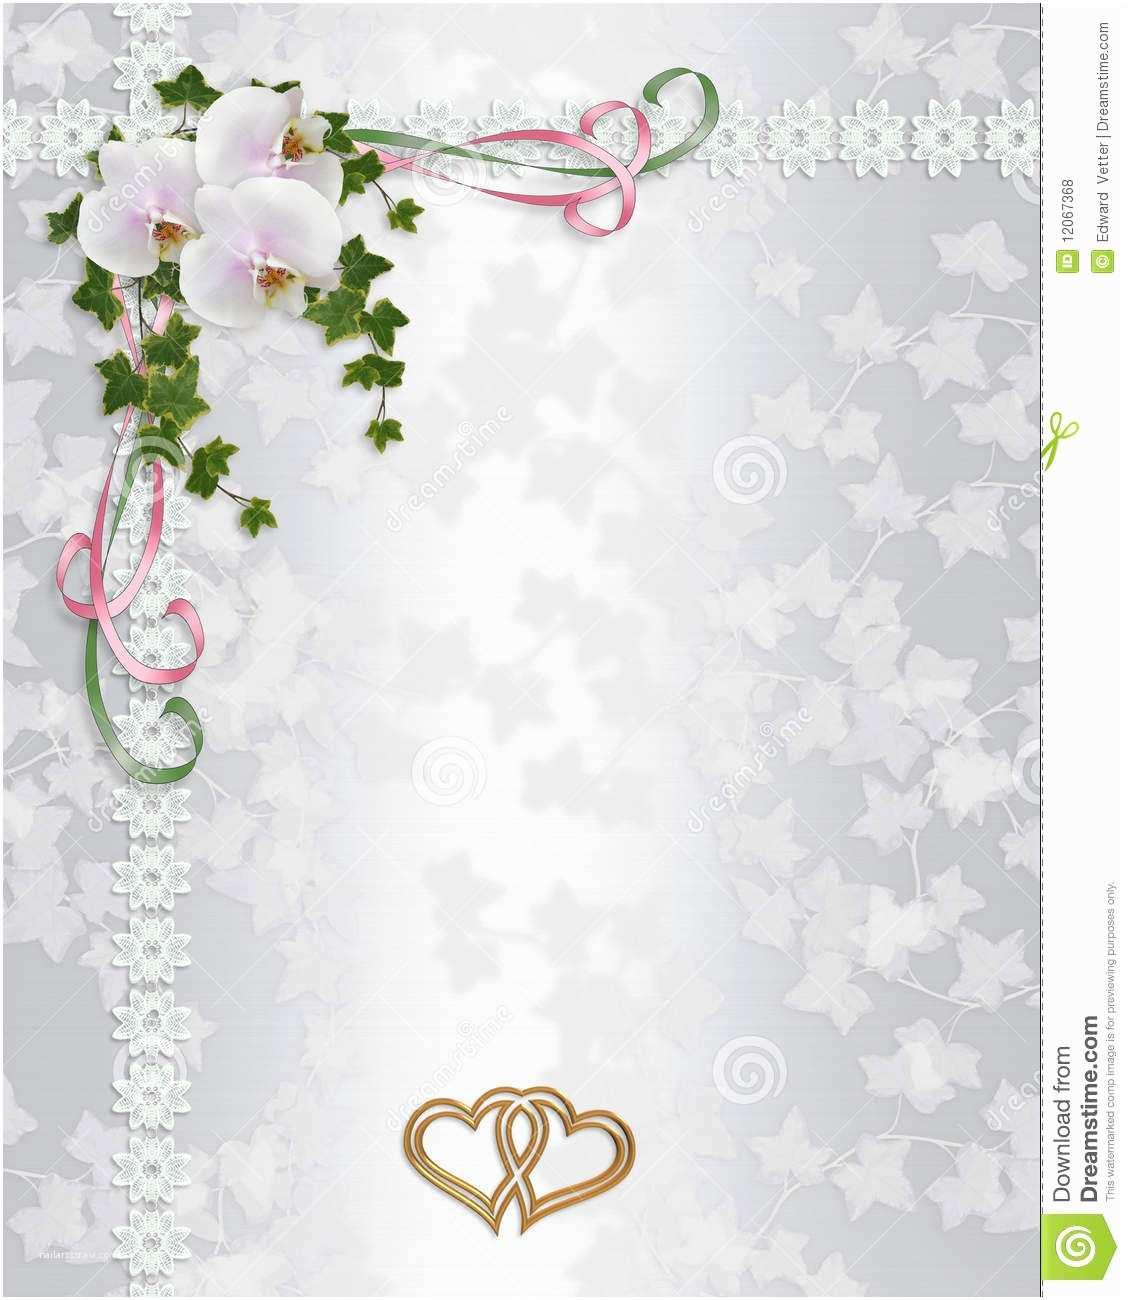 wedding invitation cards background designs